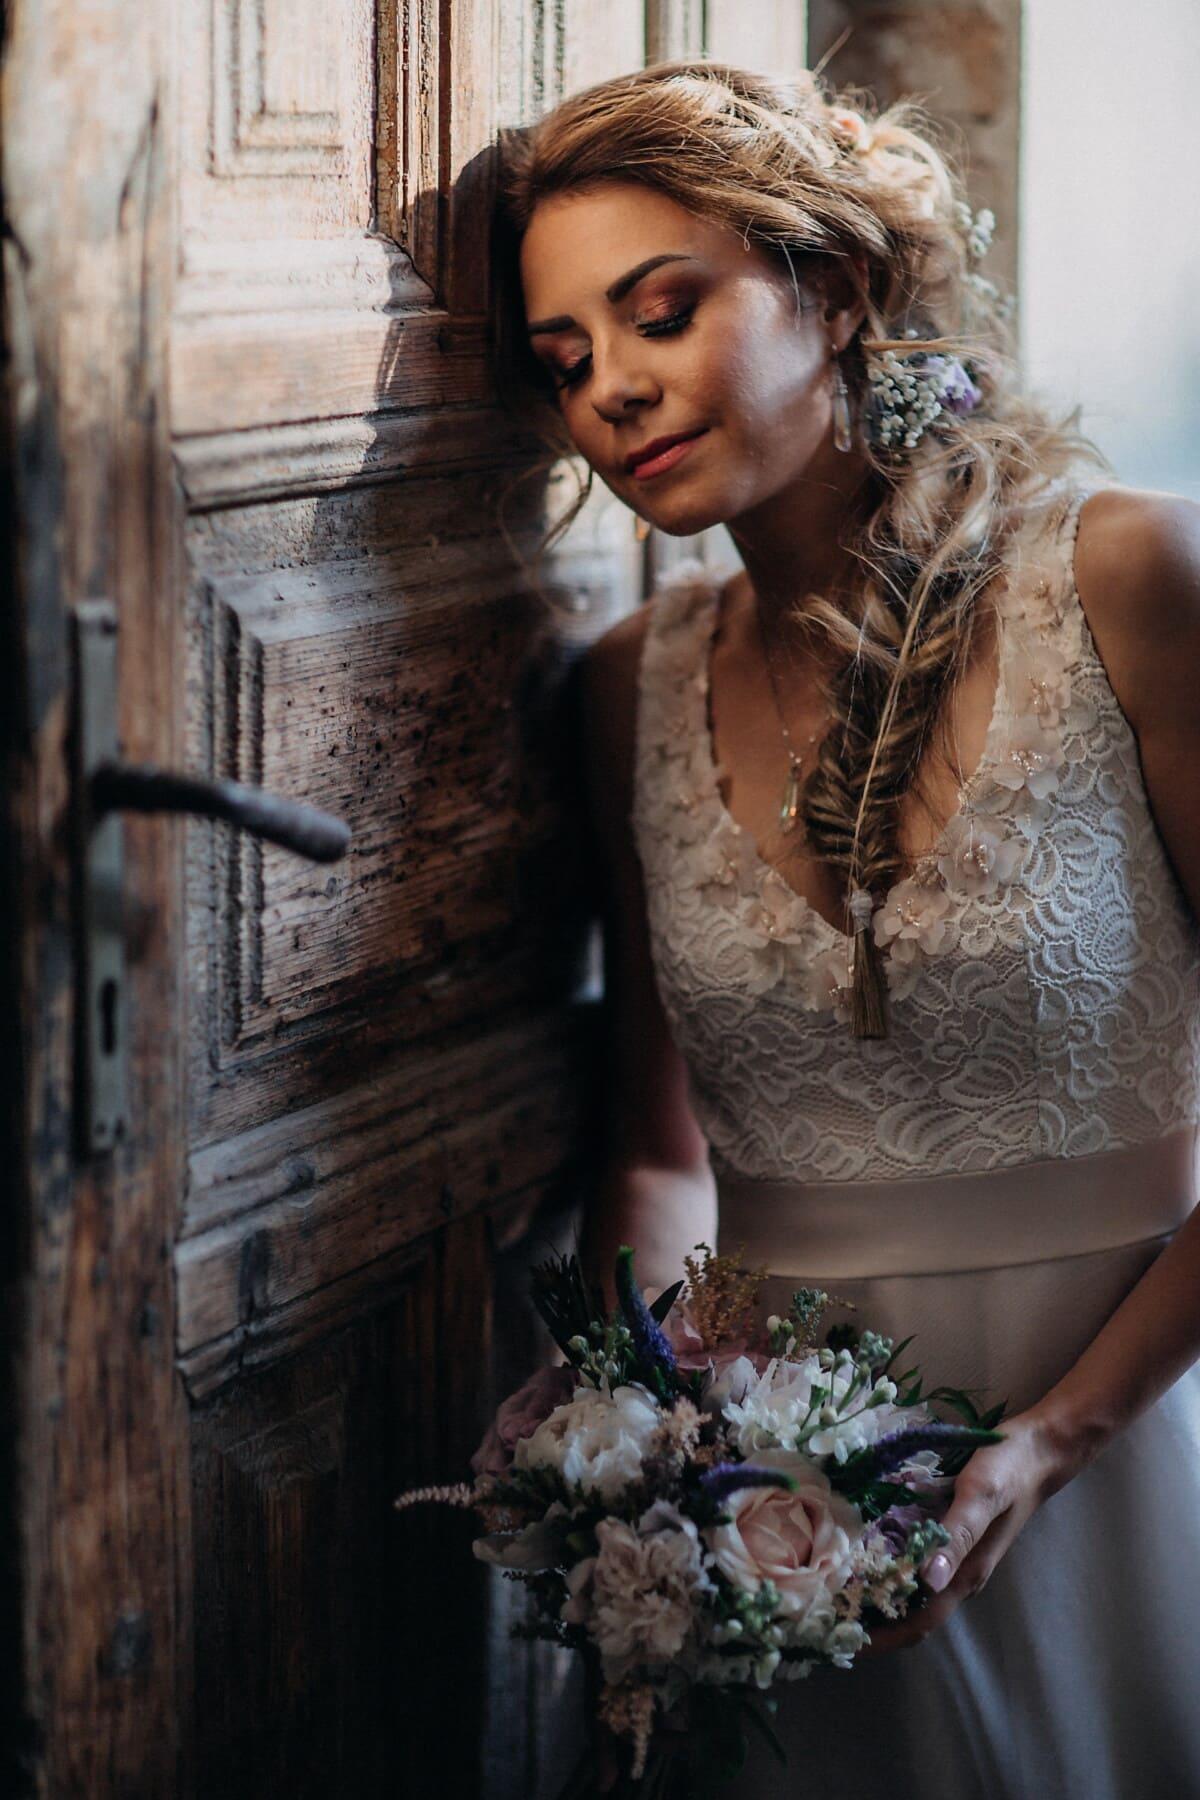 nymph, bride, gorgeous, front door, woman, attractive, fashion, portrait, pretty, model